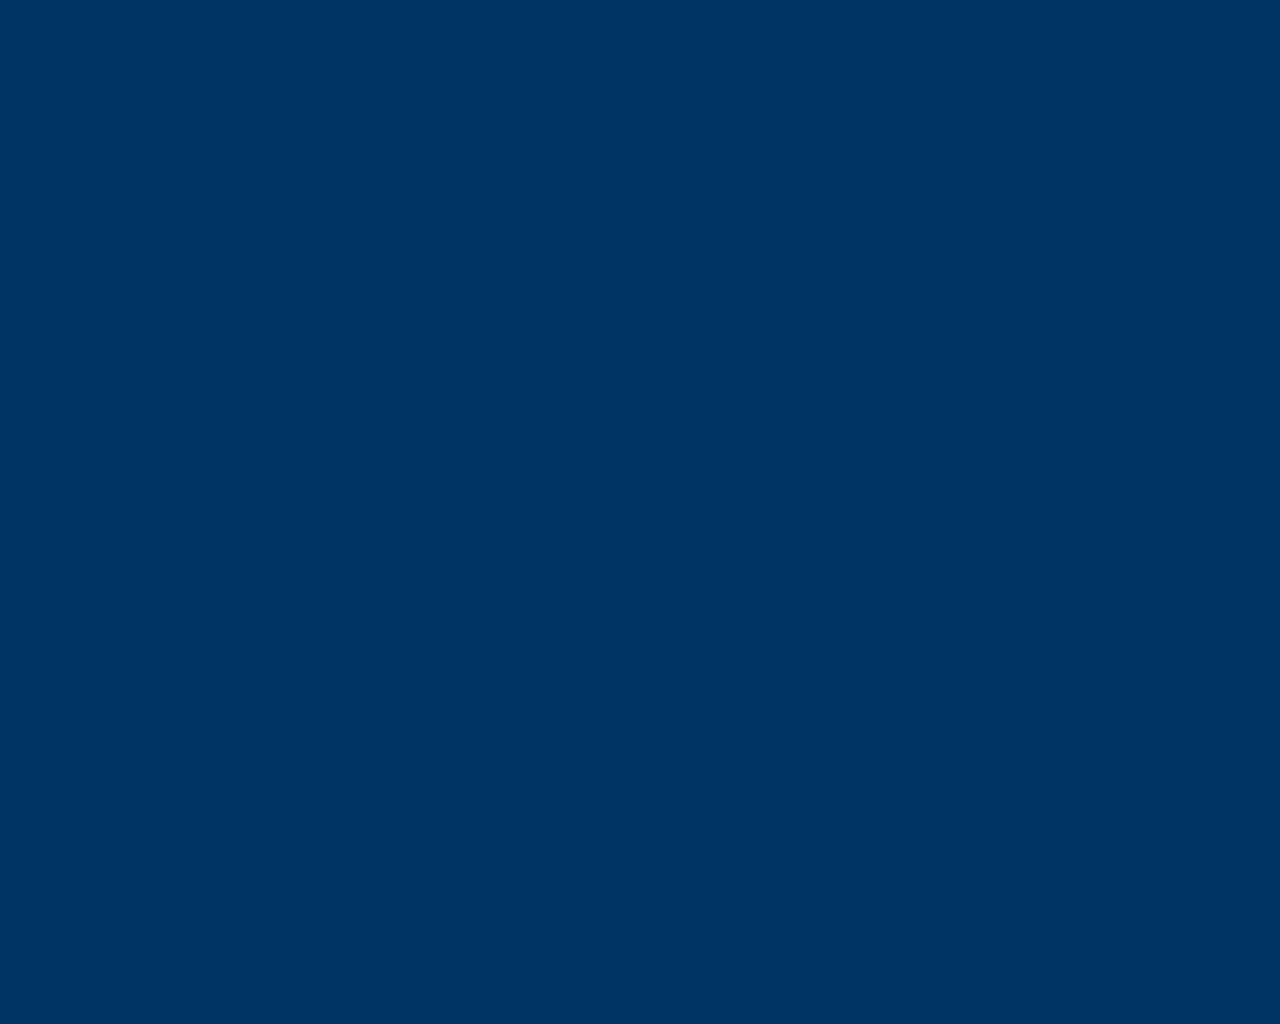 1280x1024 Dark Midnight Blue Solid Color Background